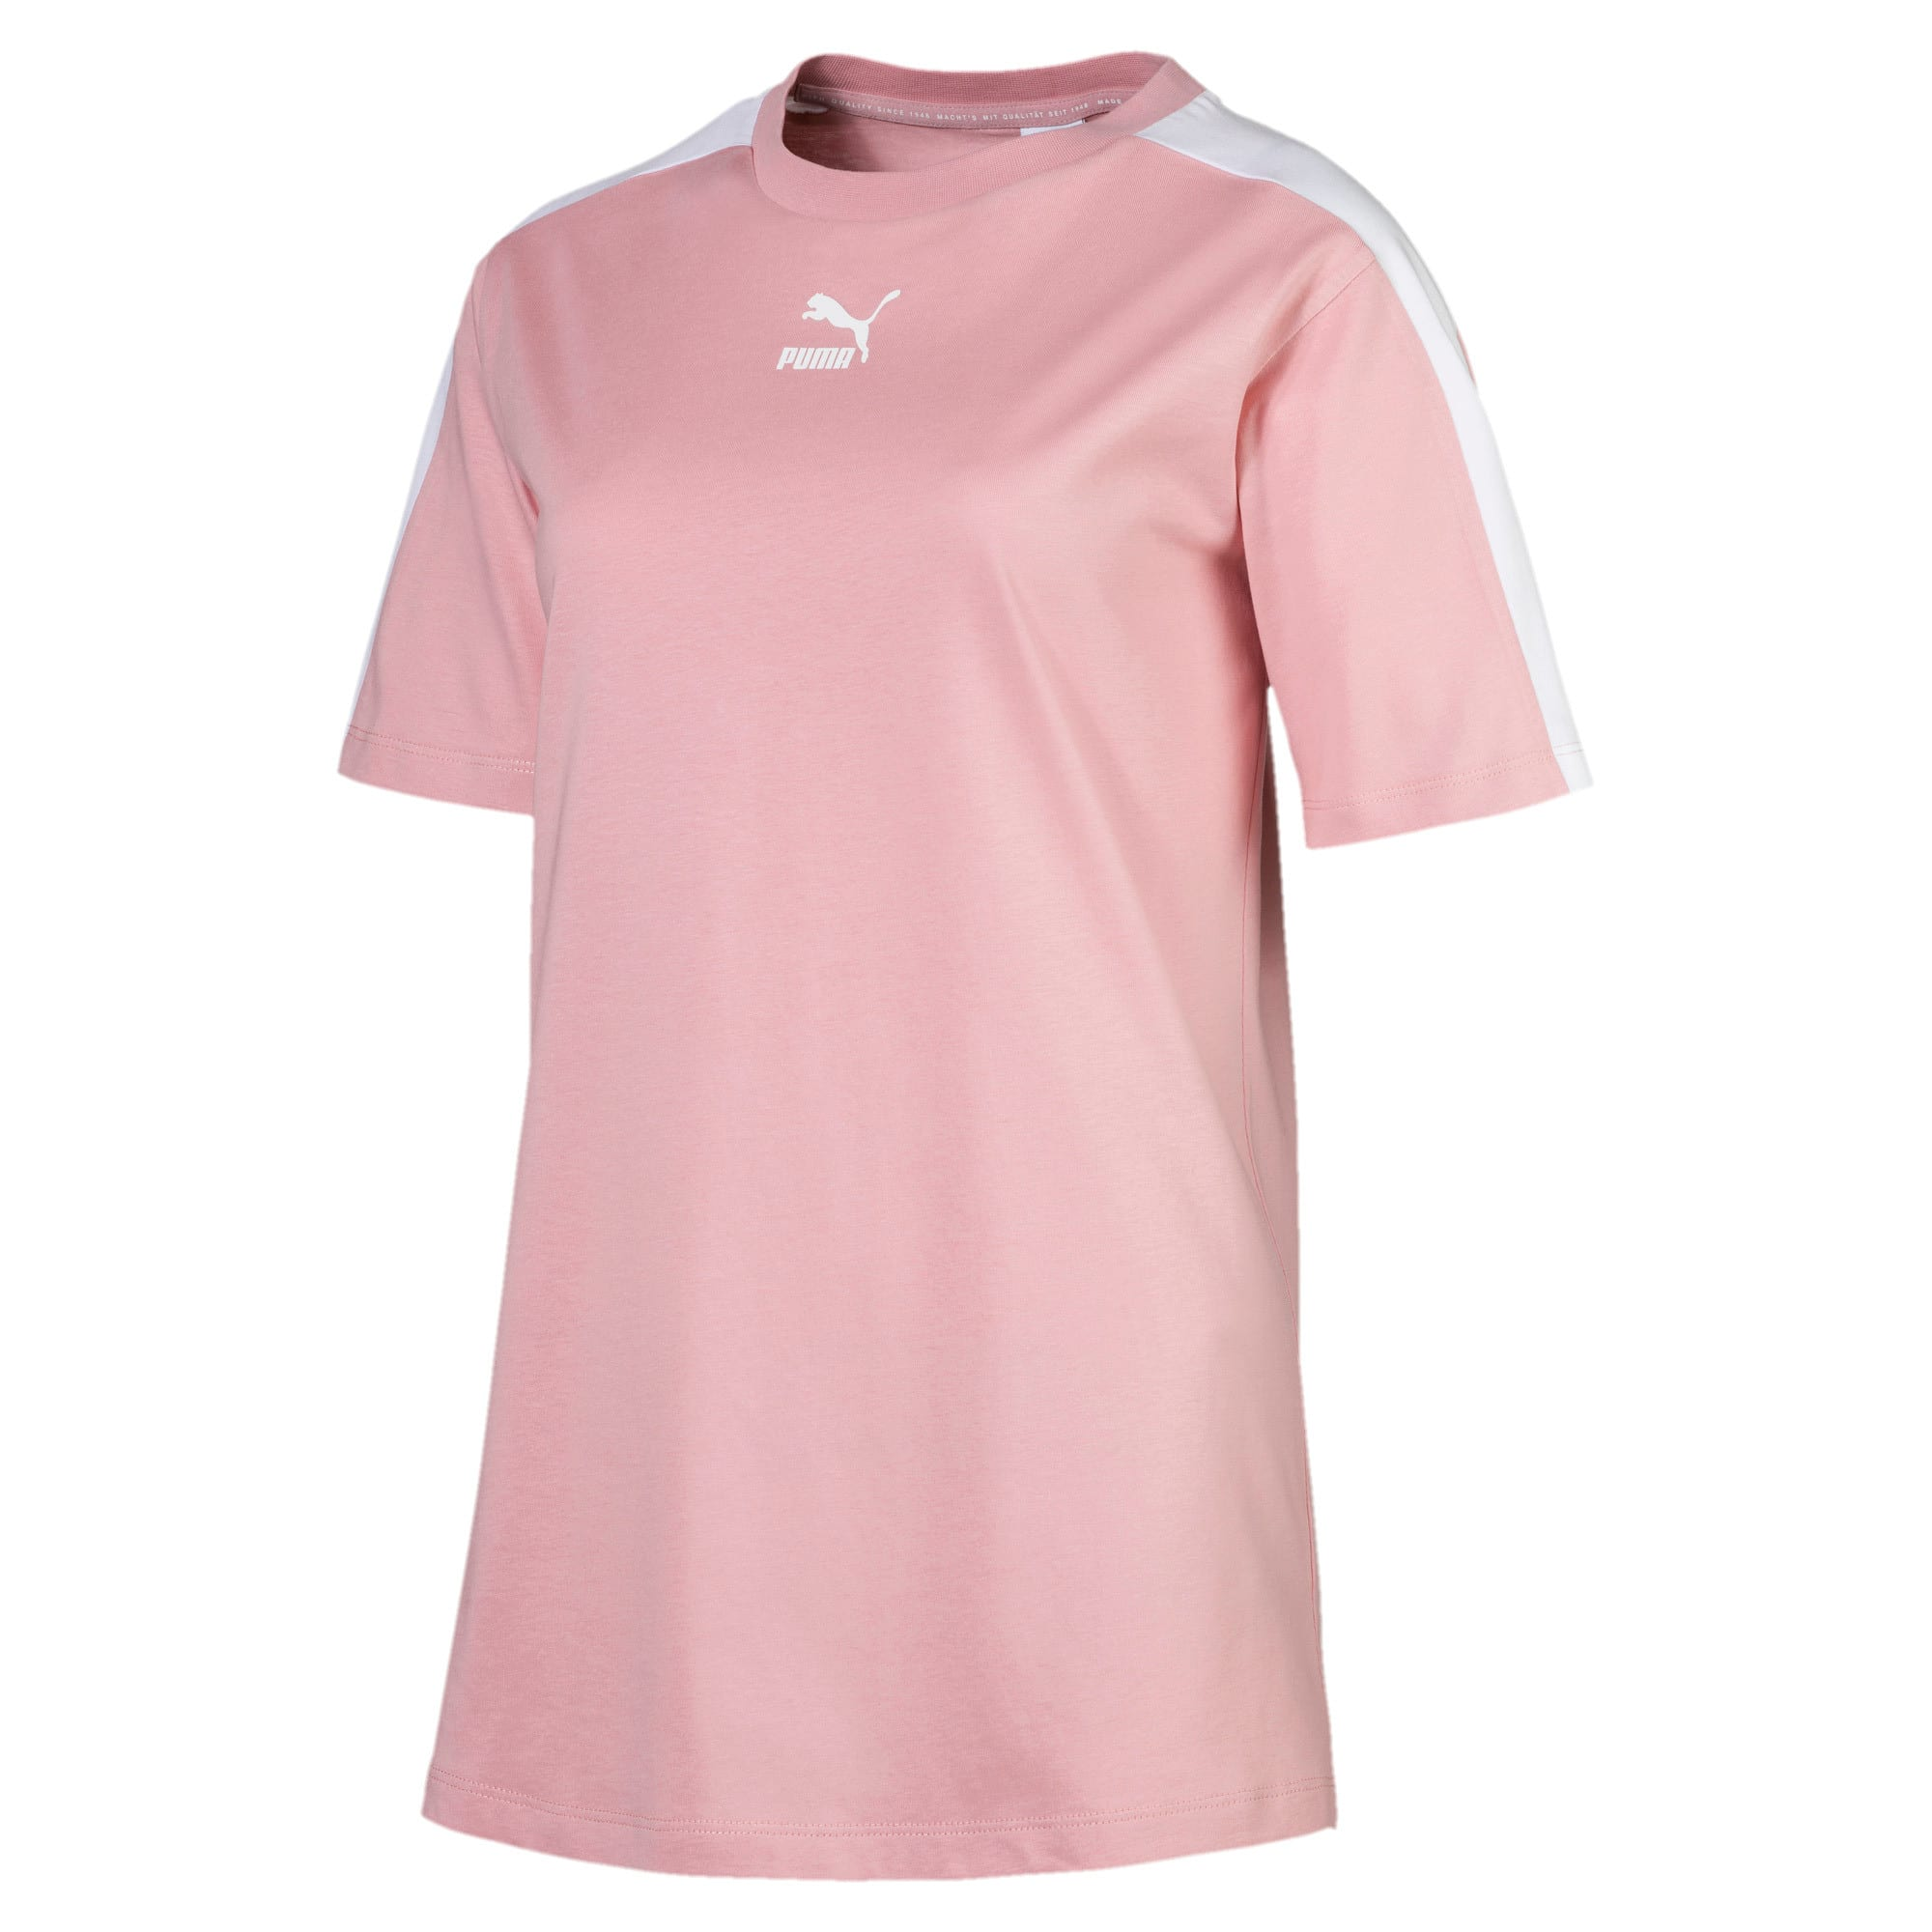 Miniatura 4 de Camiseta Classics T7 para mujer, Bridal Rose, mediano